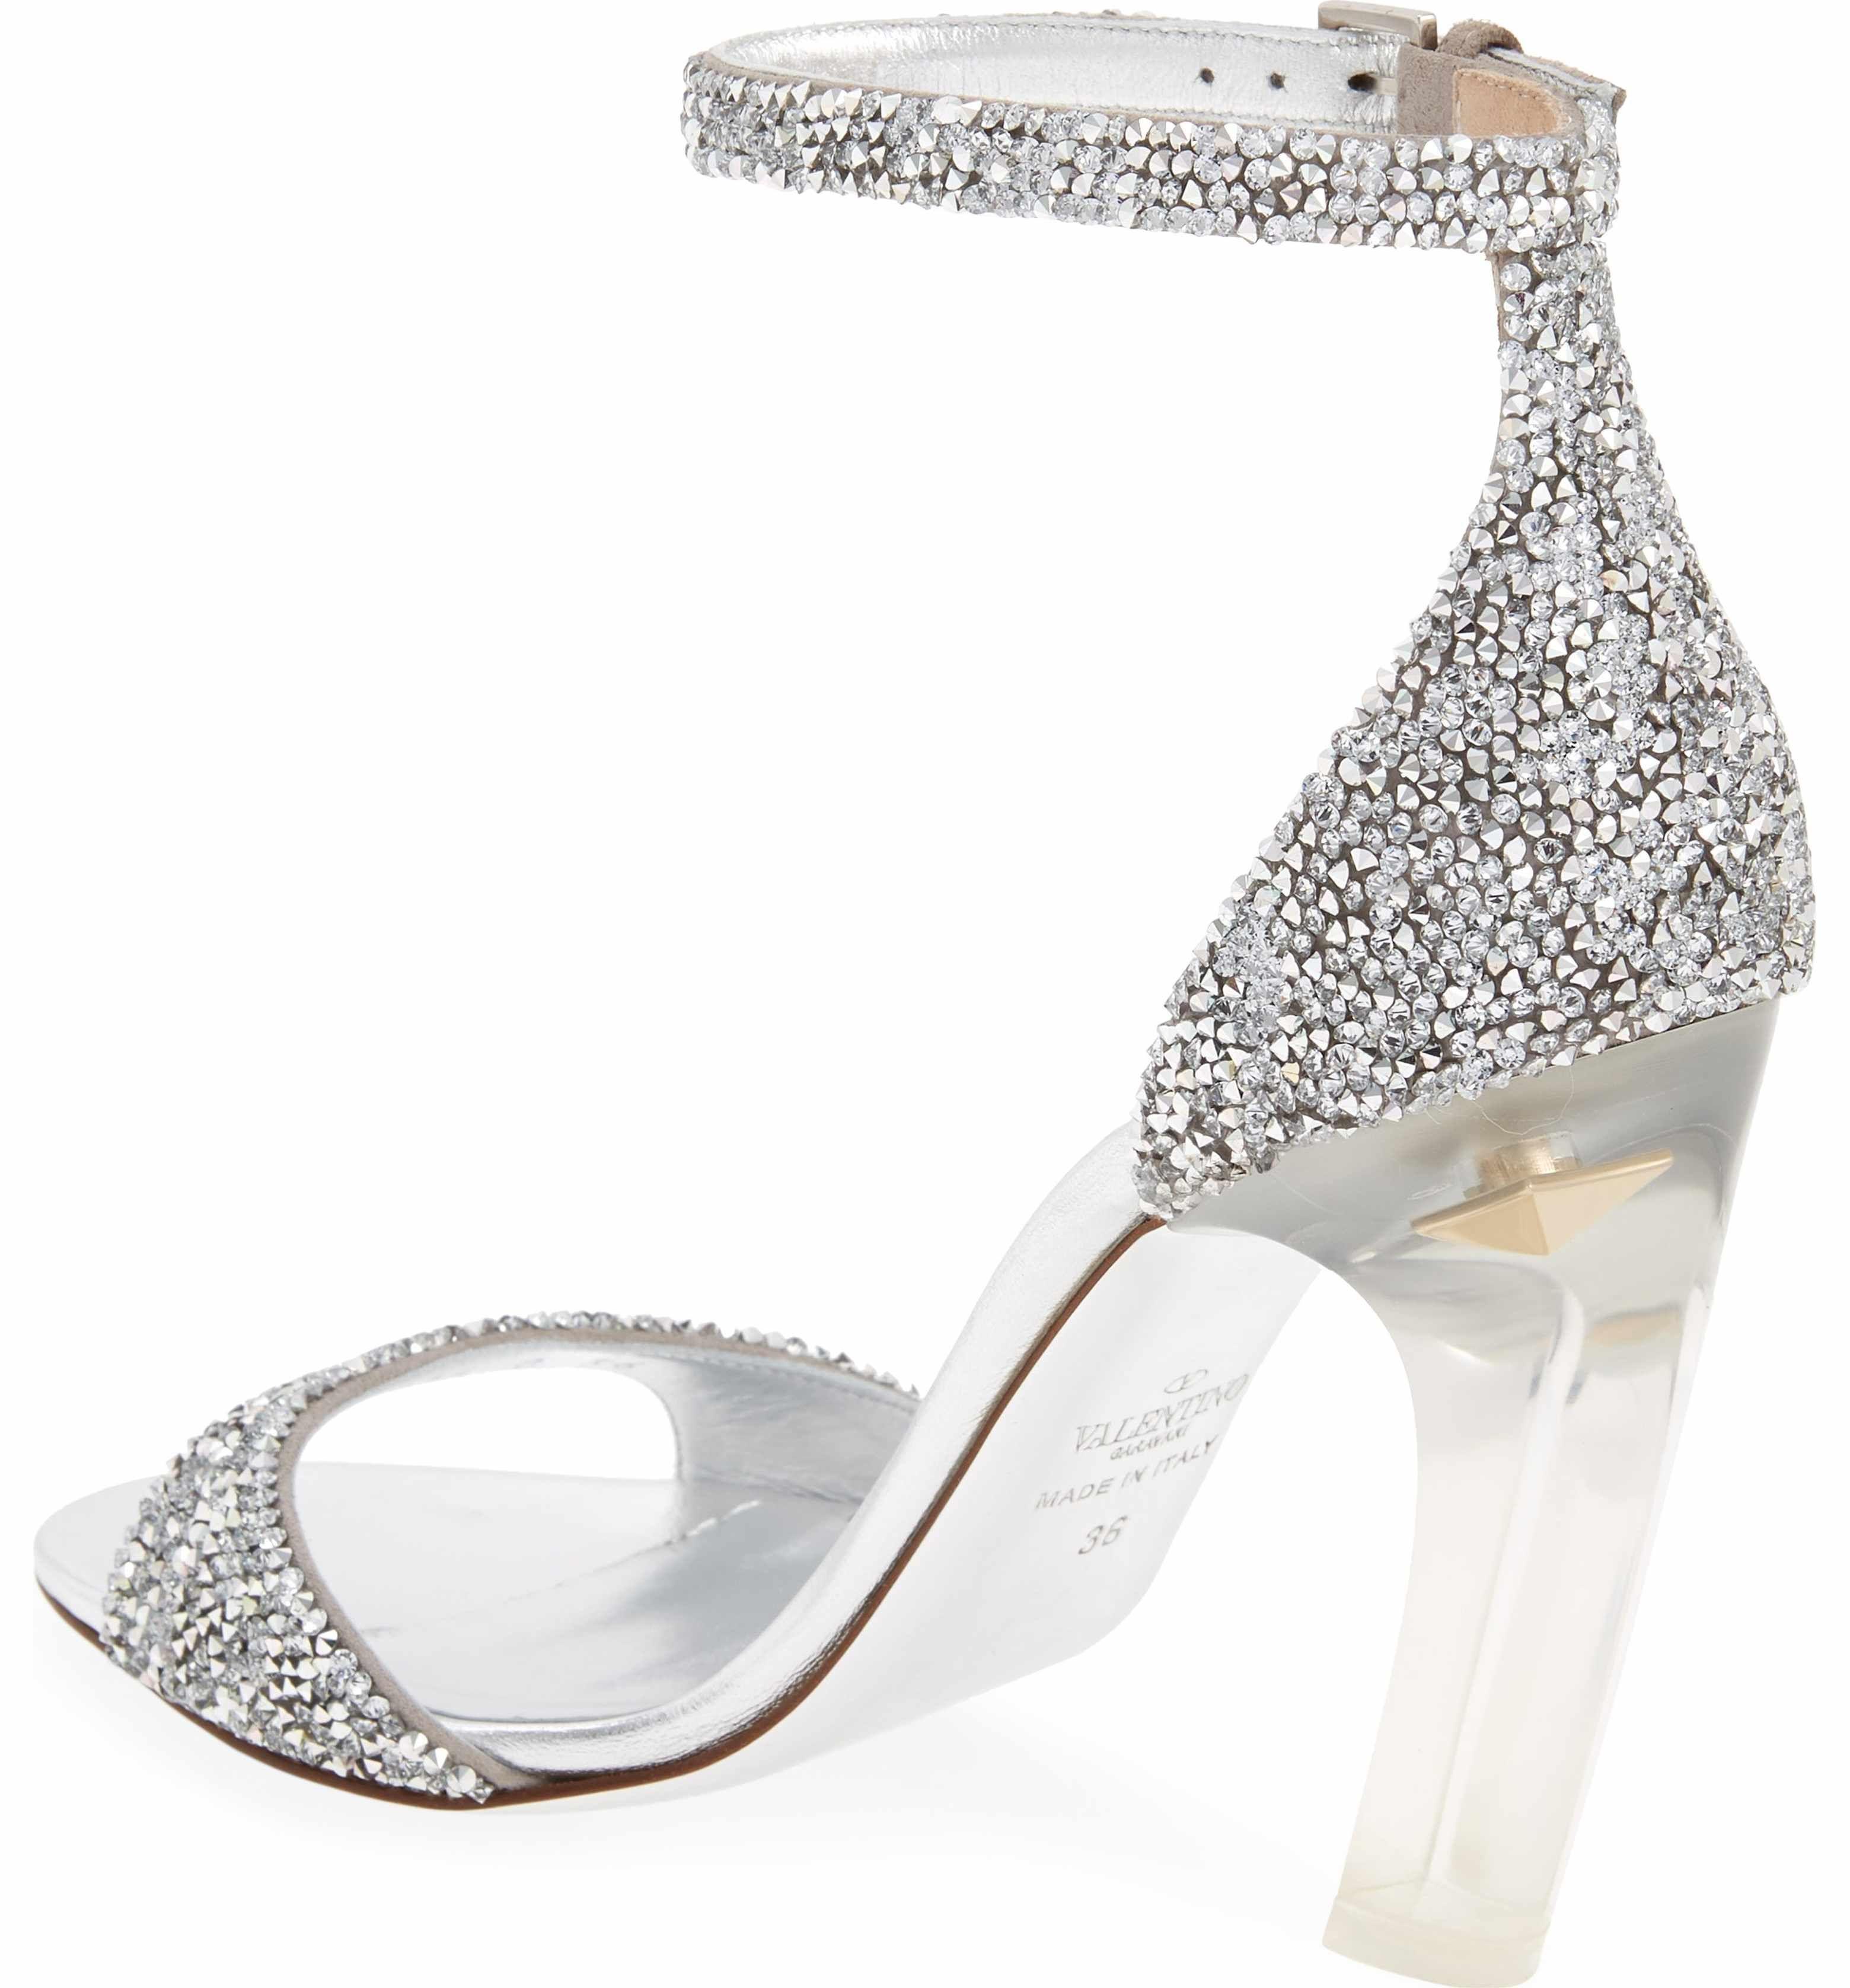 207570c3258 Main Image - VALENTINO GARAVANI Crystal Embellished Clear Heel Sandal  (Women)